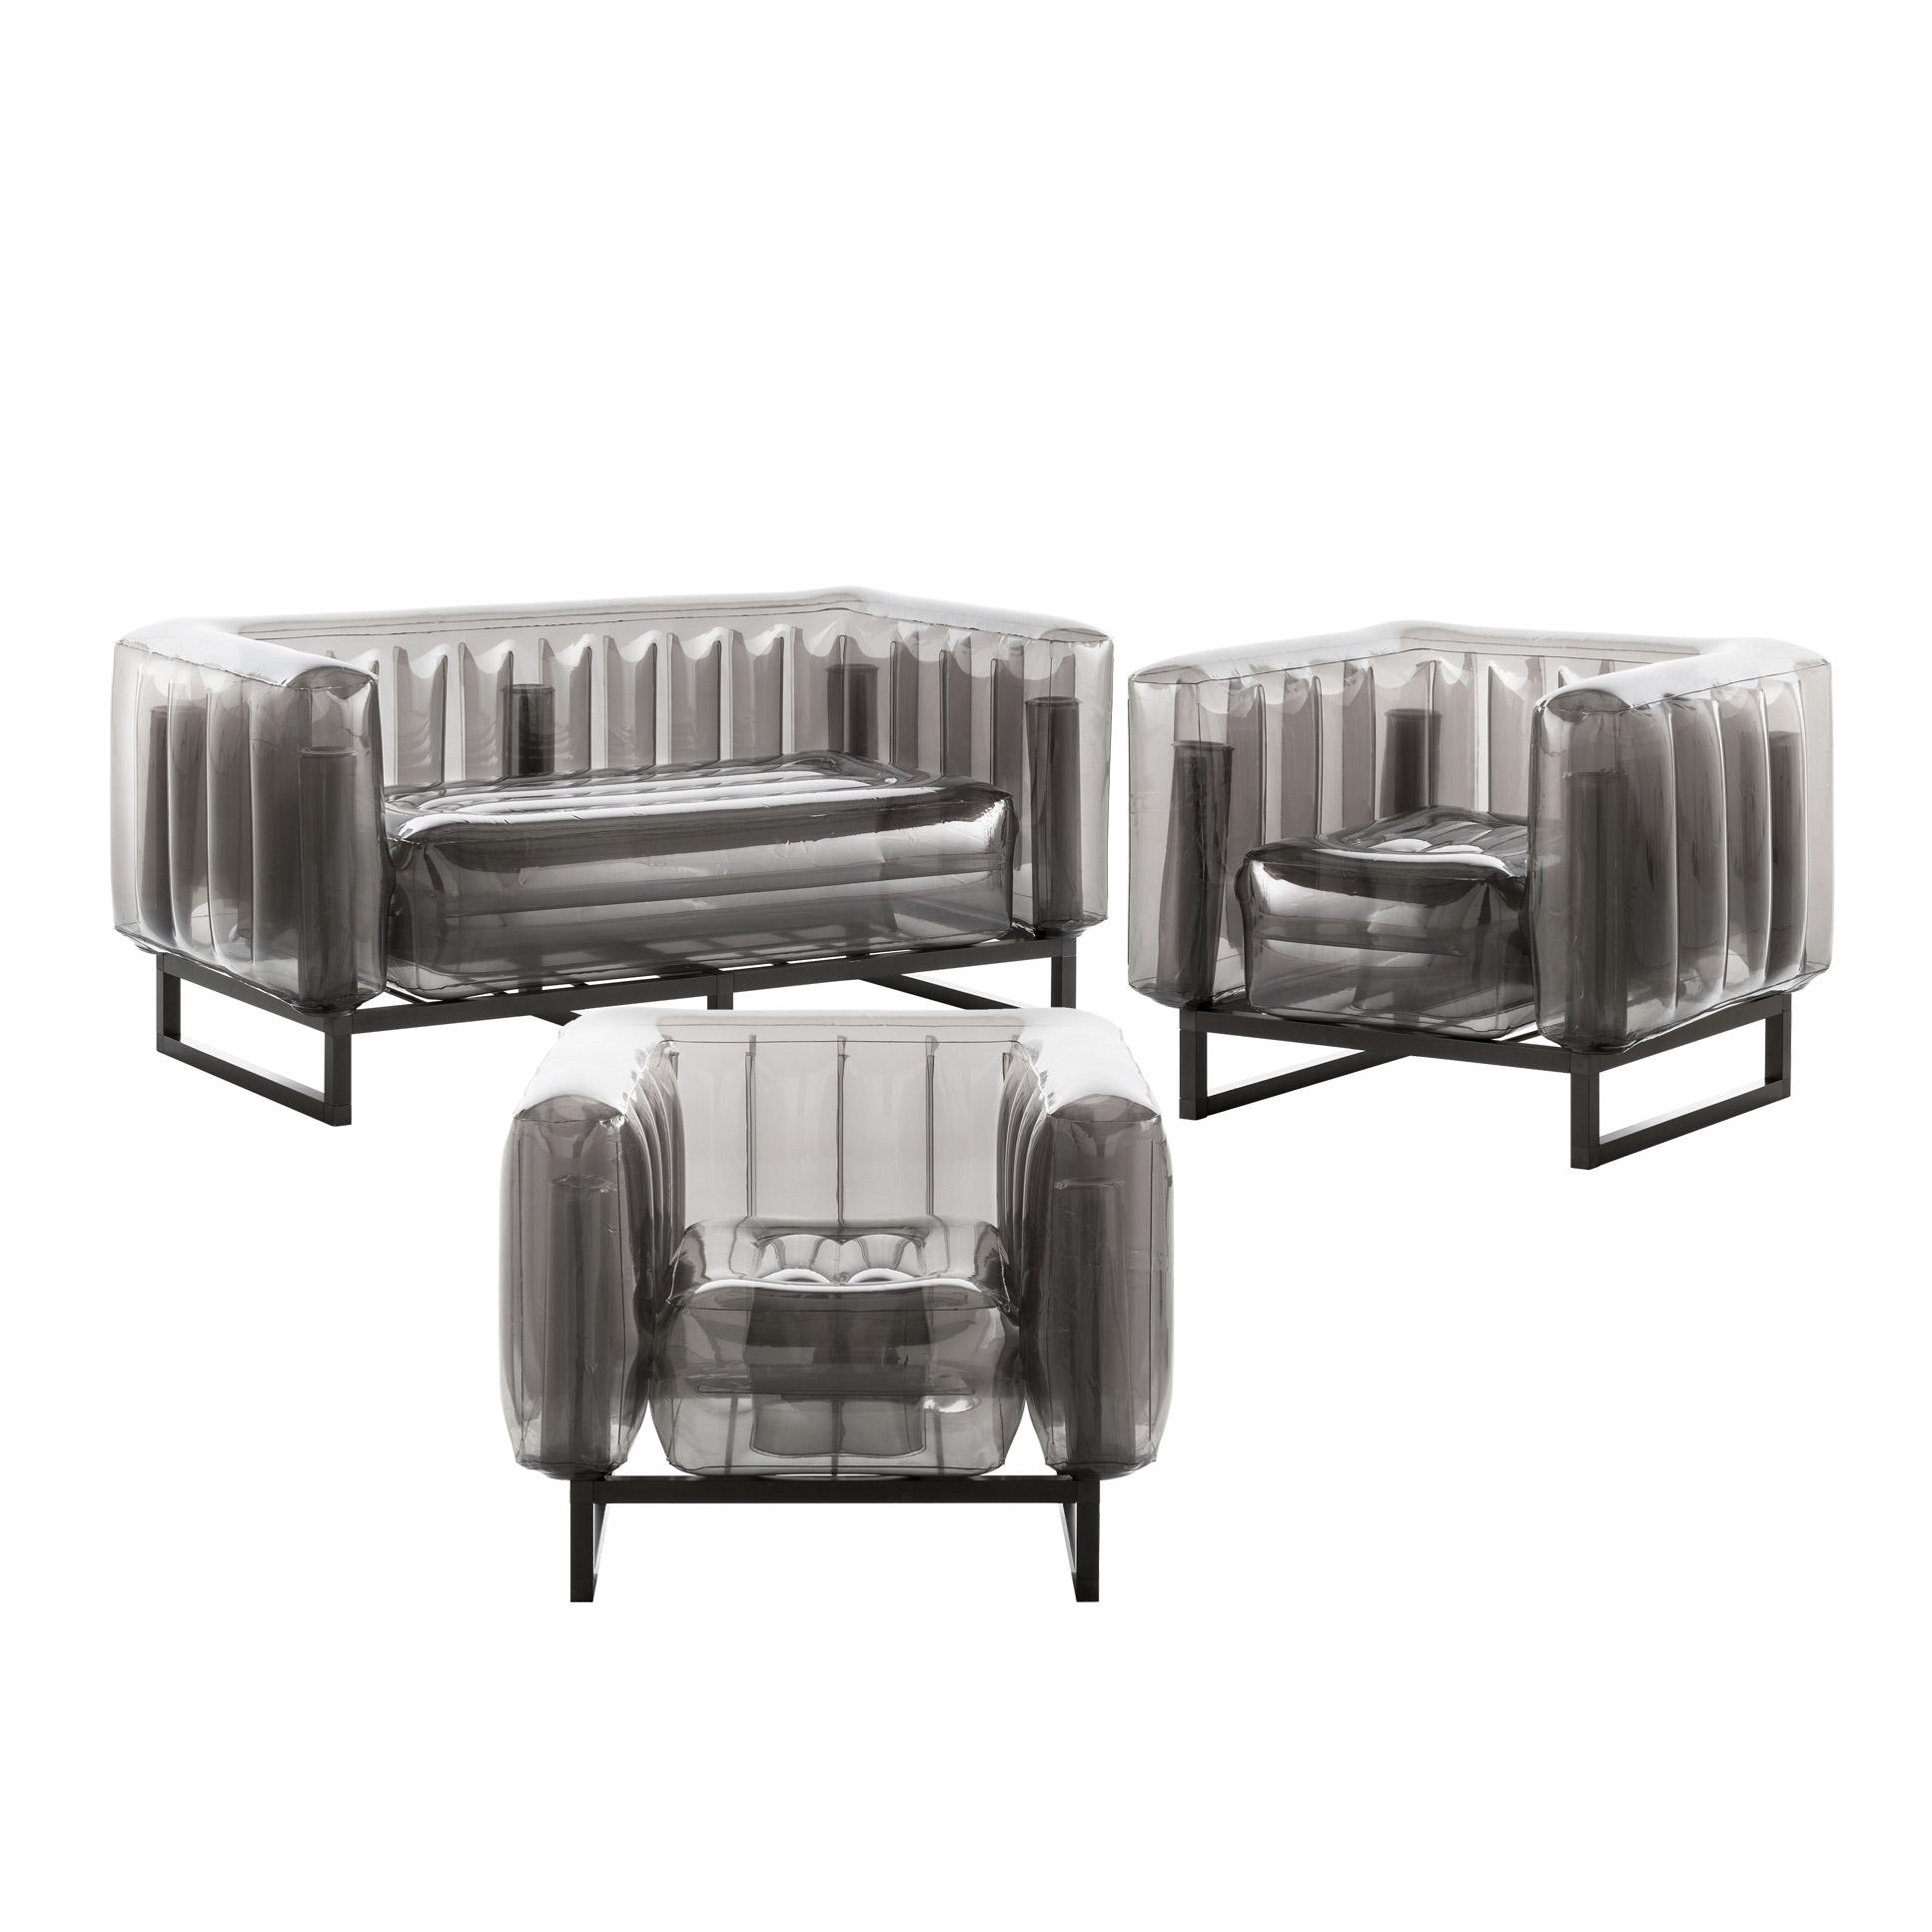 Salon de jardin design 1 canapé et 2 fauteuils noirs cadre aluminium